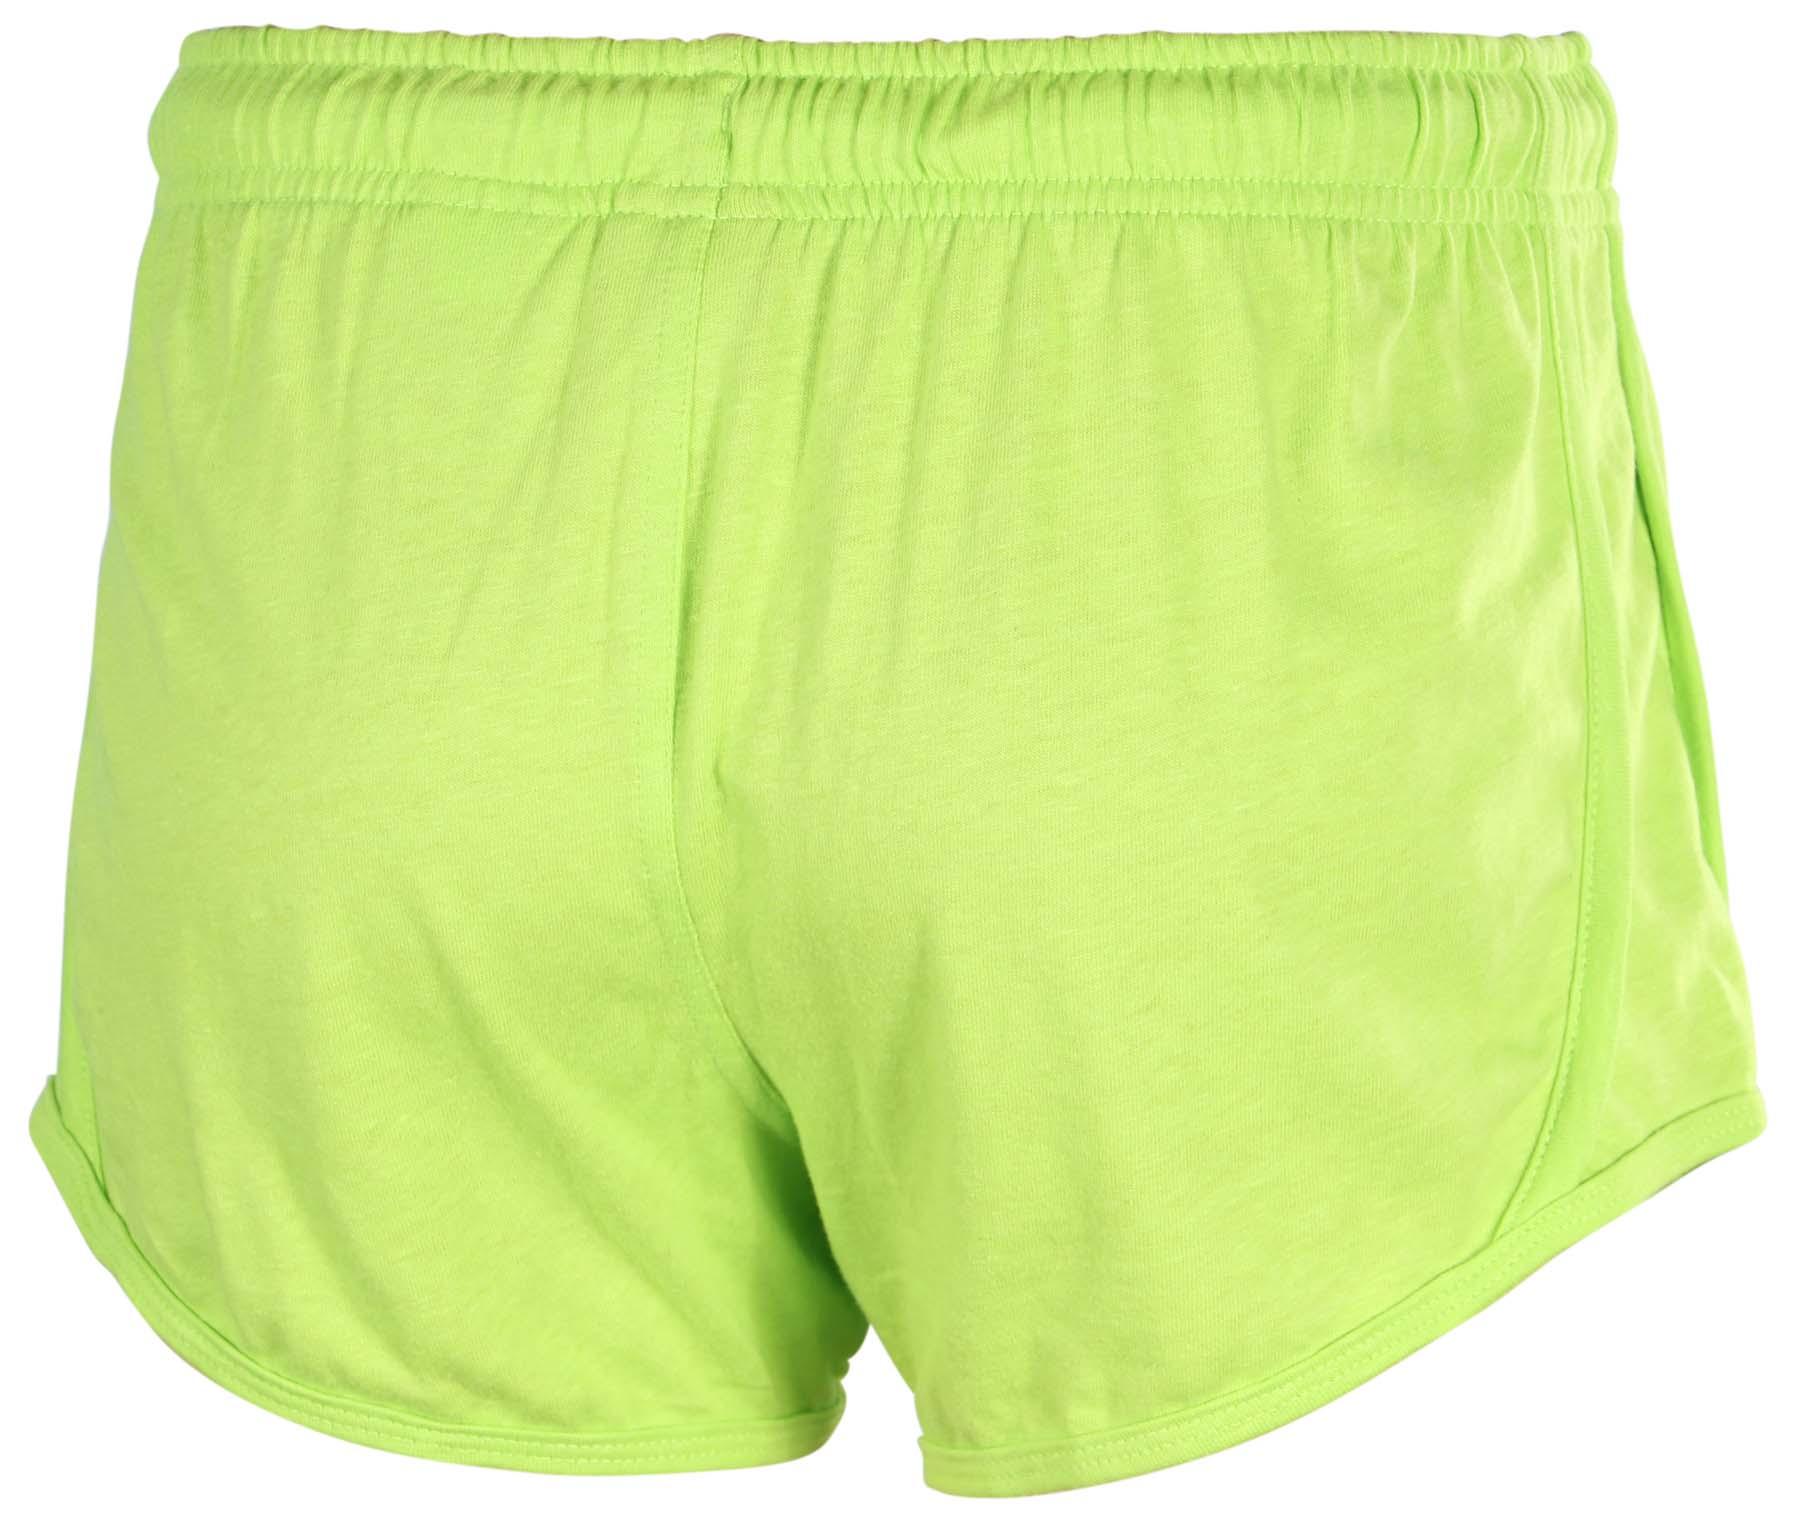 Unique Nike Womens Lightweight Jersey Lounge Shorts SAVE 50 Large Medium